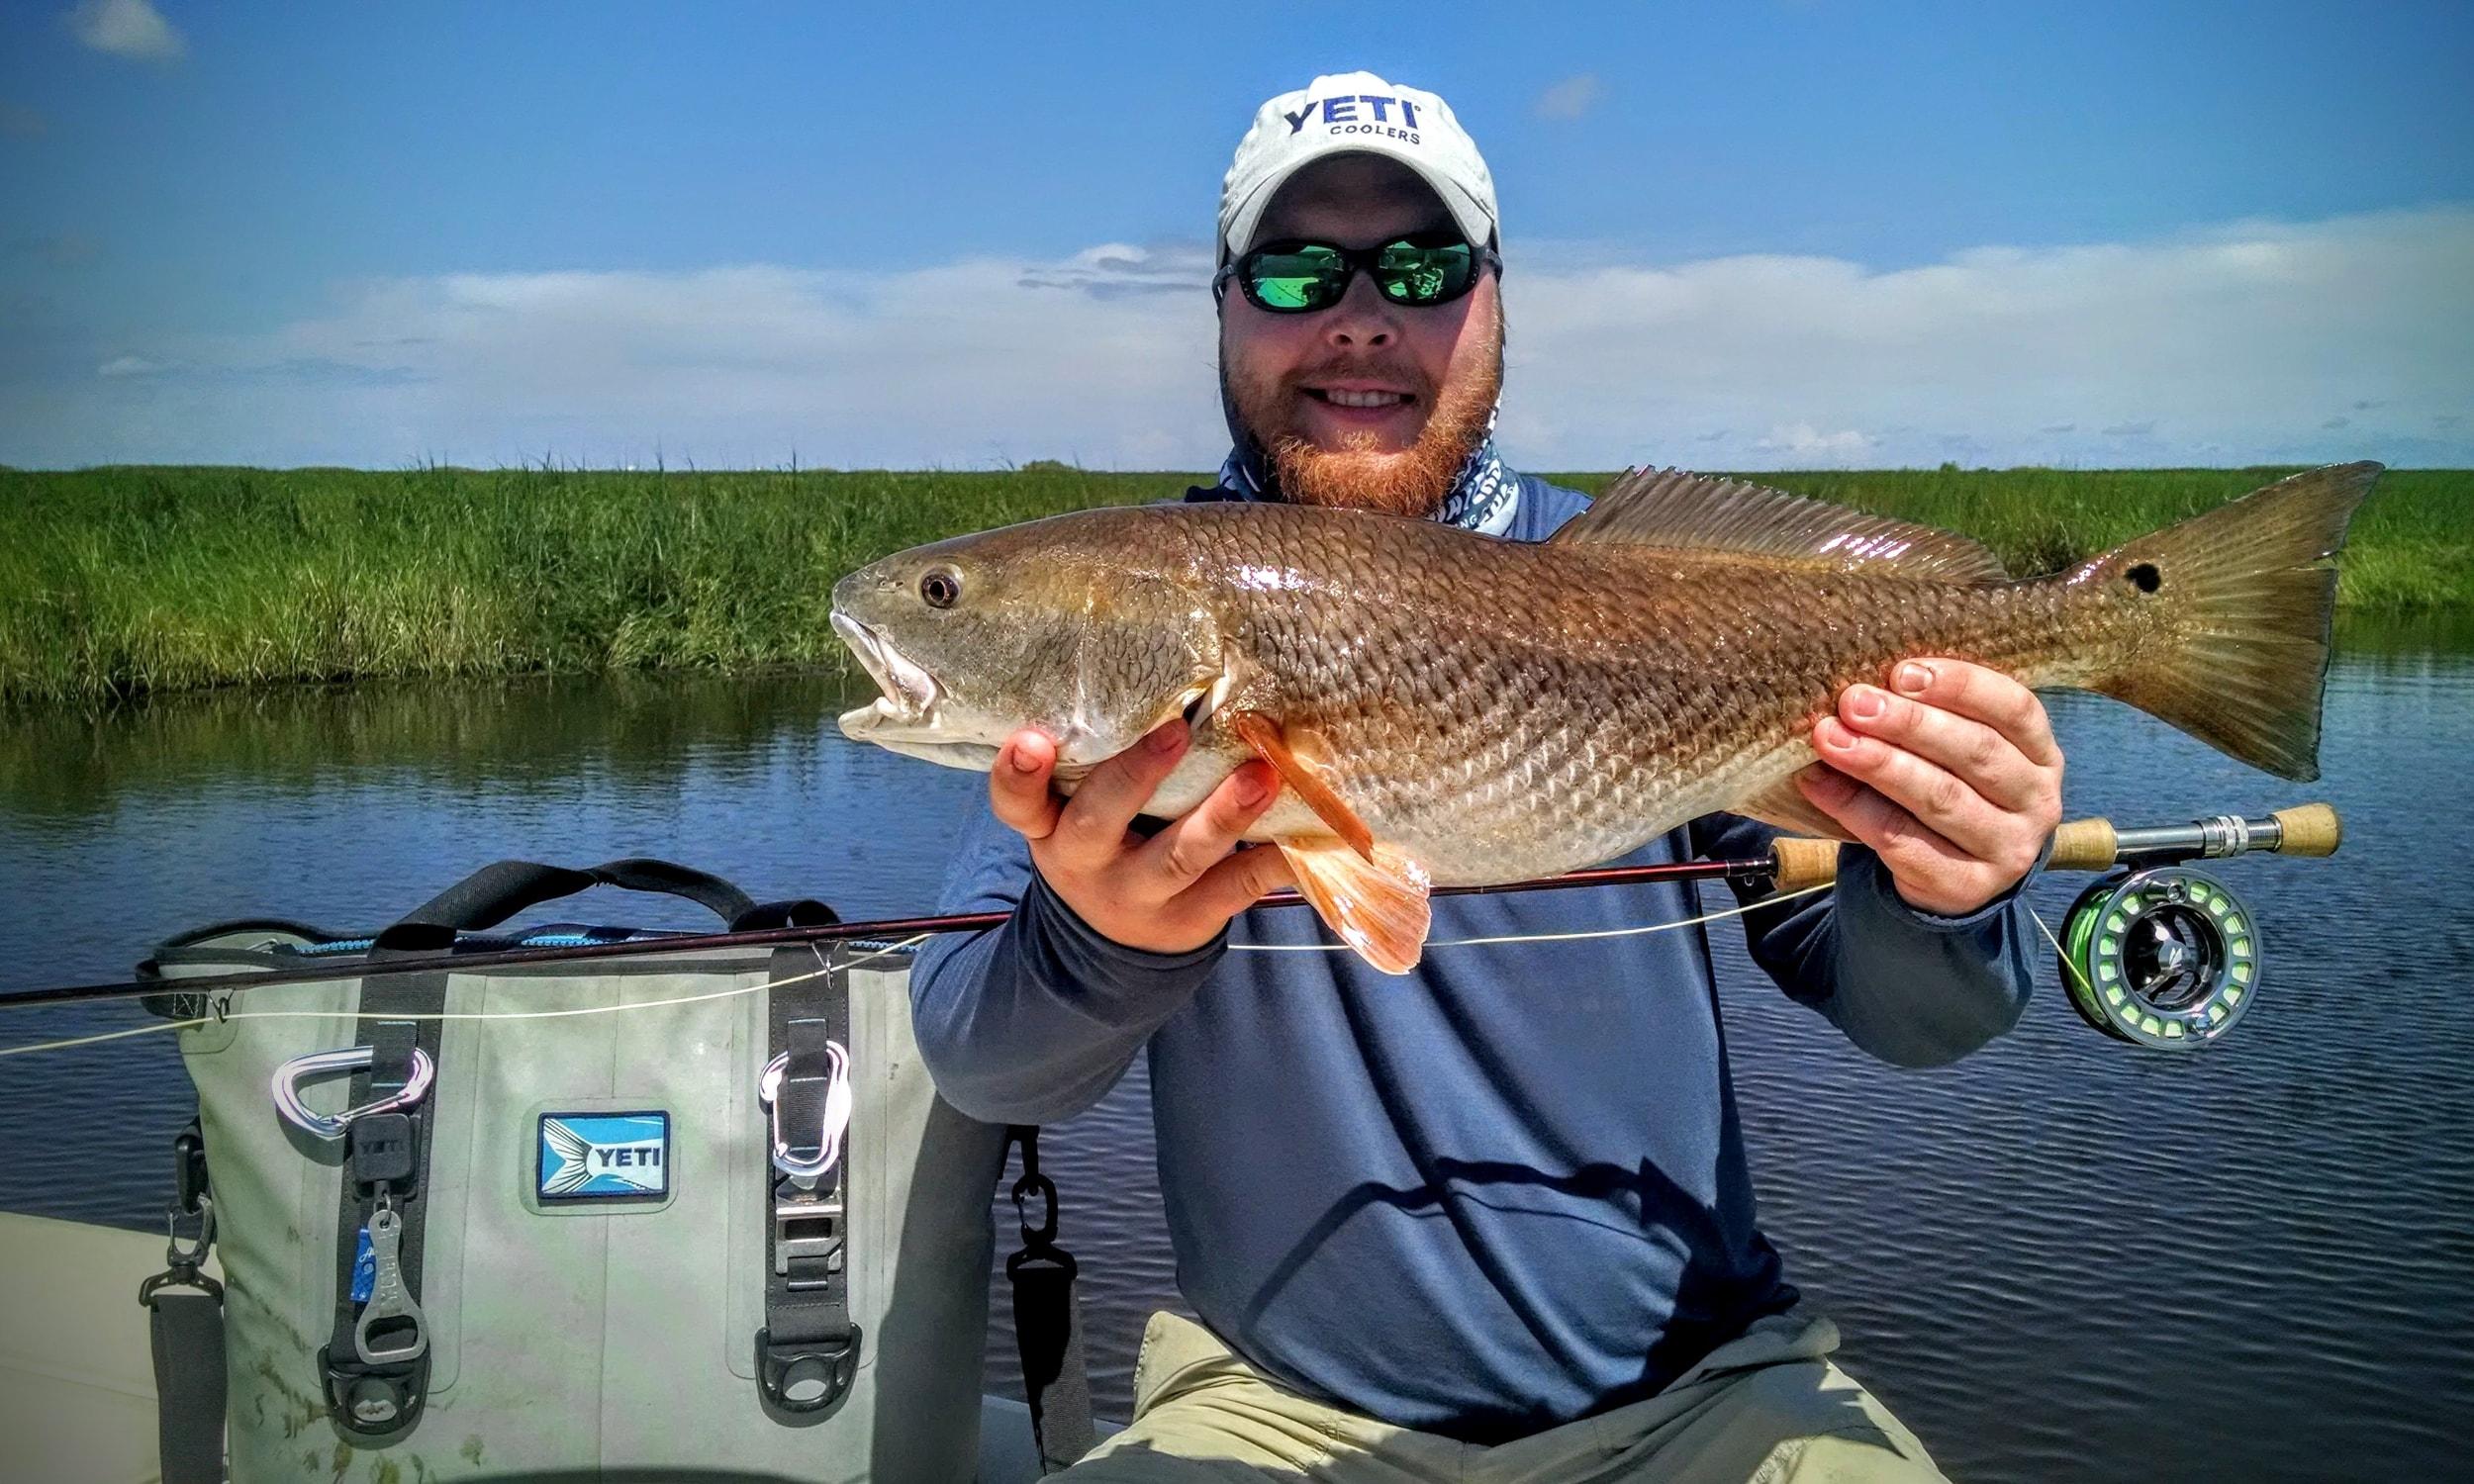 Louisiana fly fishing adventure south guide service for Louisiana fly fishing